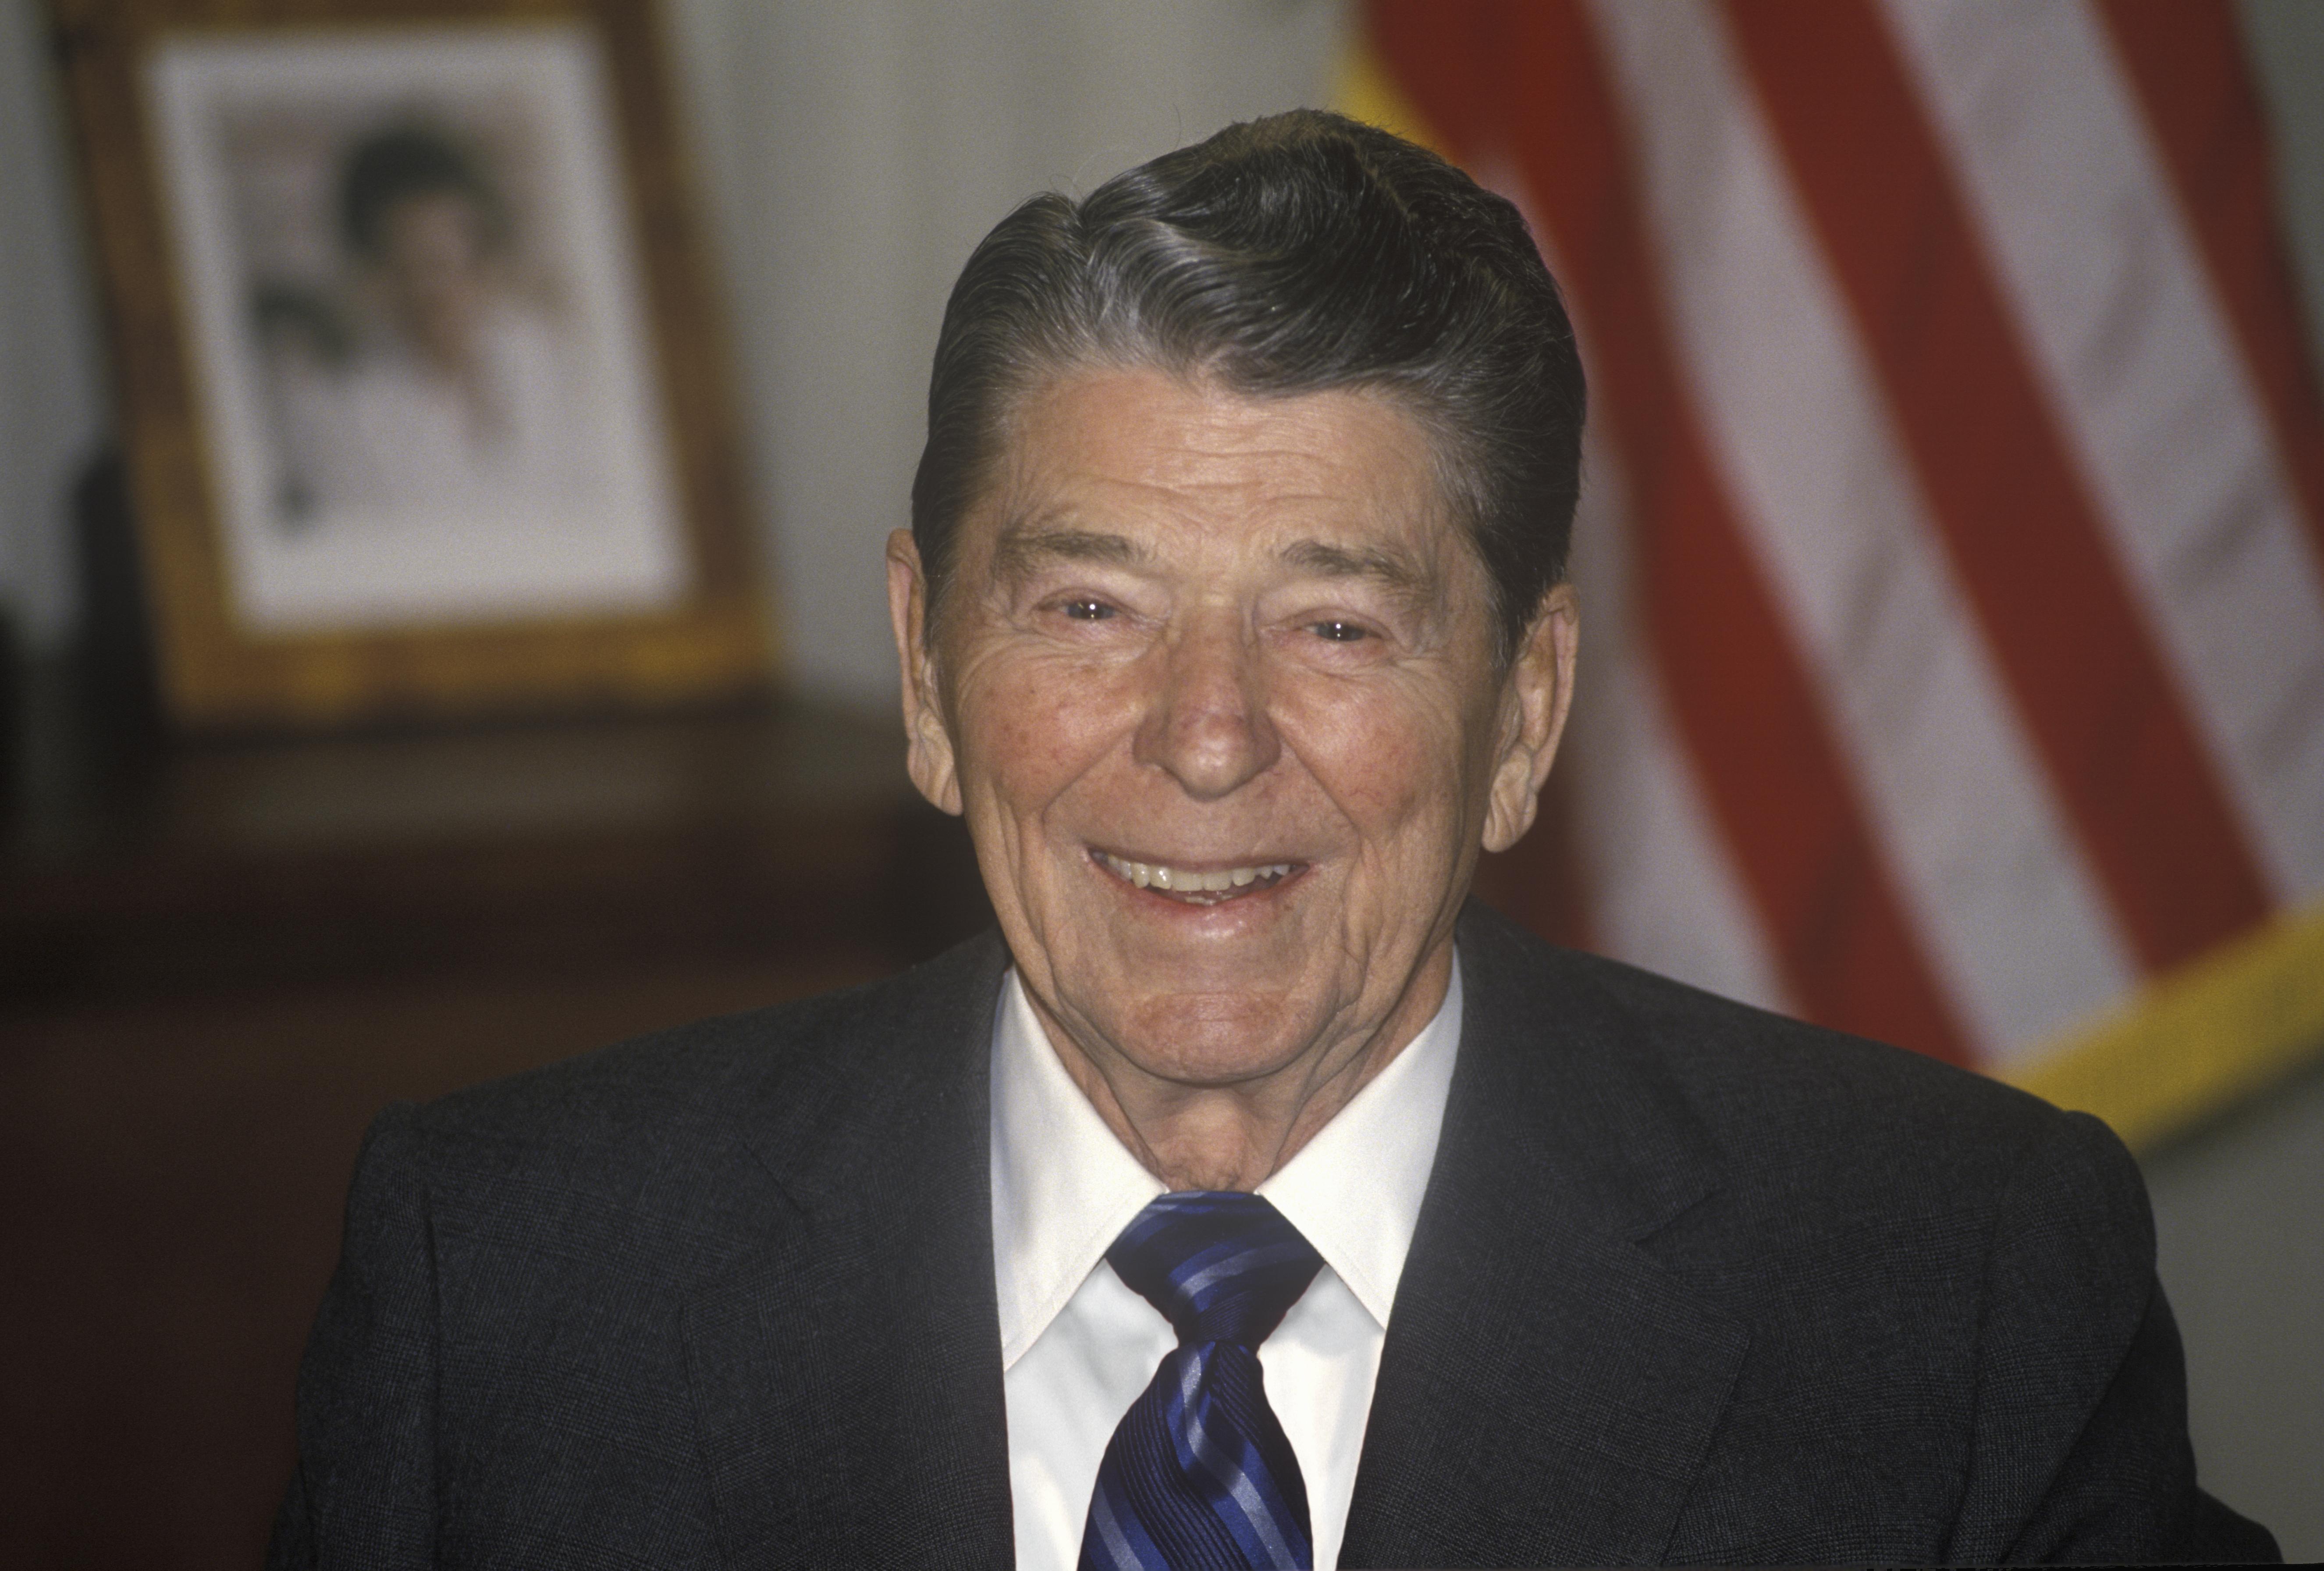 ronald reagan success quotes, insulting politicians